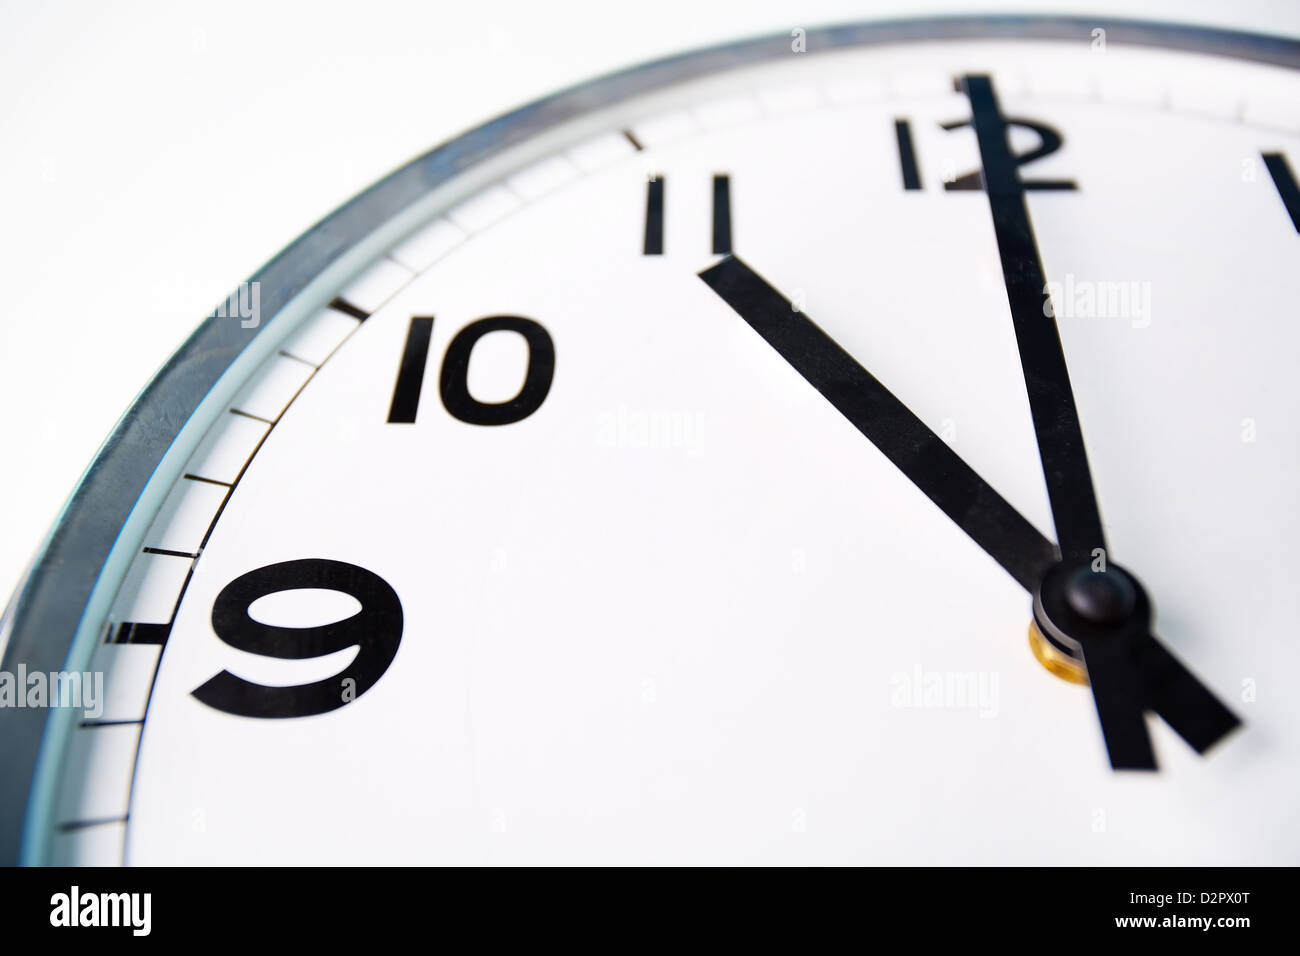 Macro shot of a clock face showing eleven o'clock - Stock Image